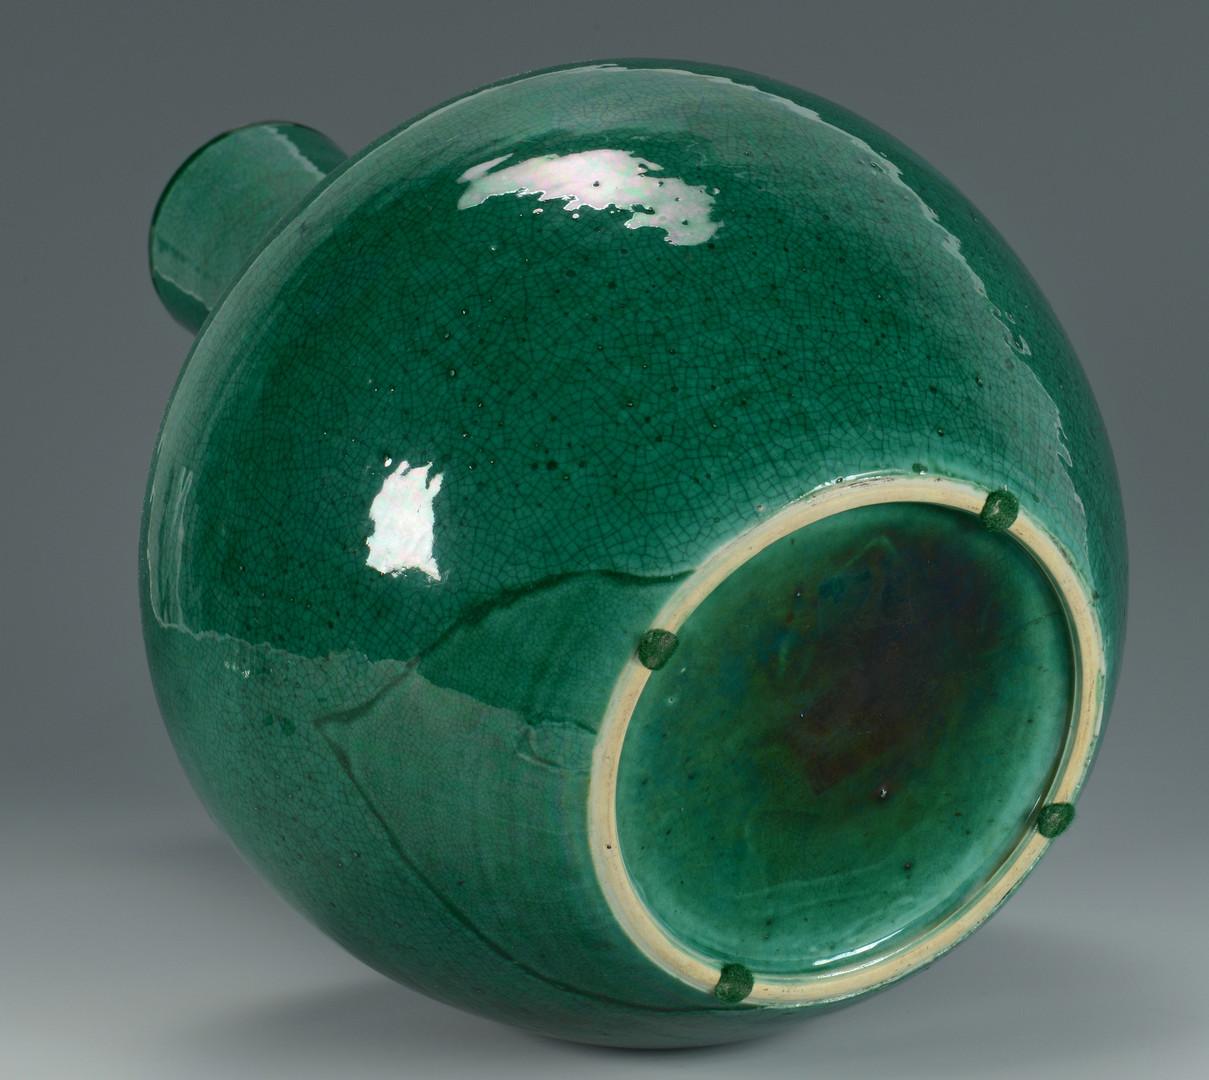 Lot 231: Large Chinese Green Porcelain Bottle Vase